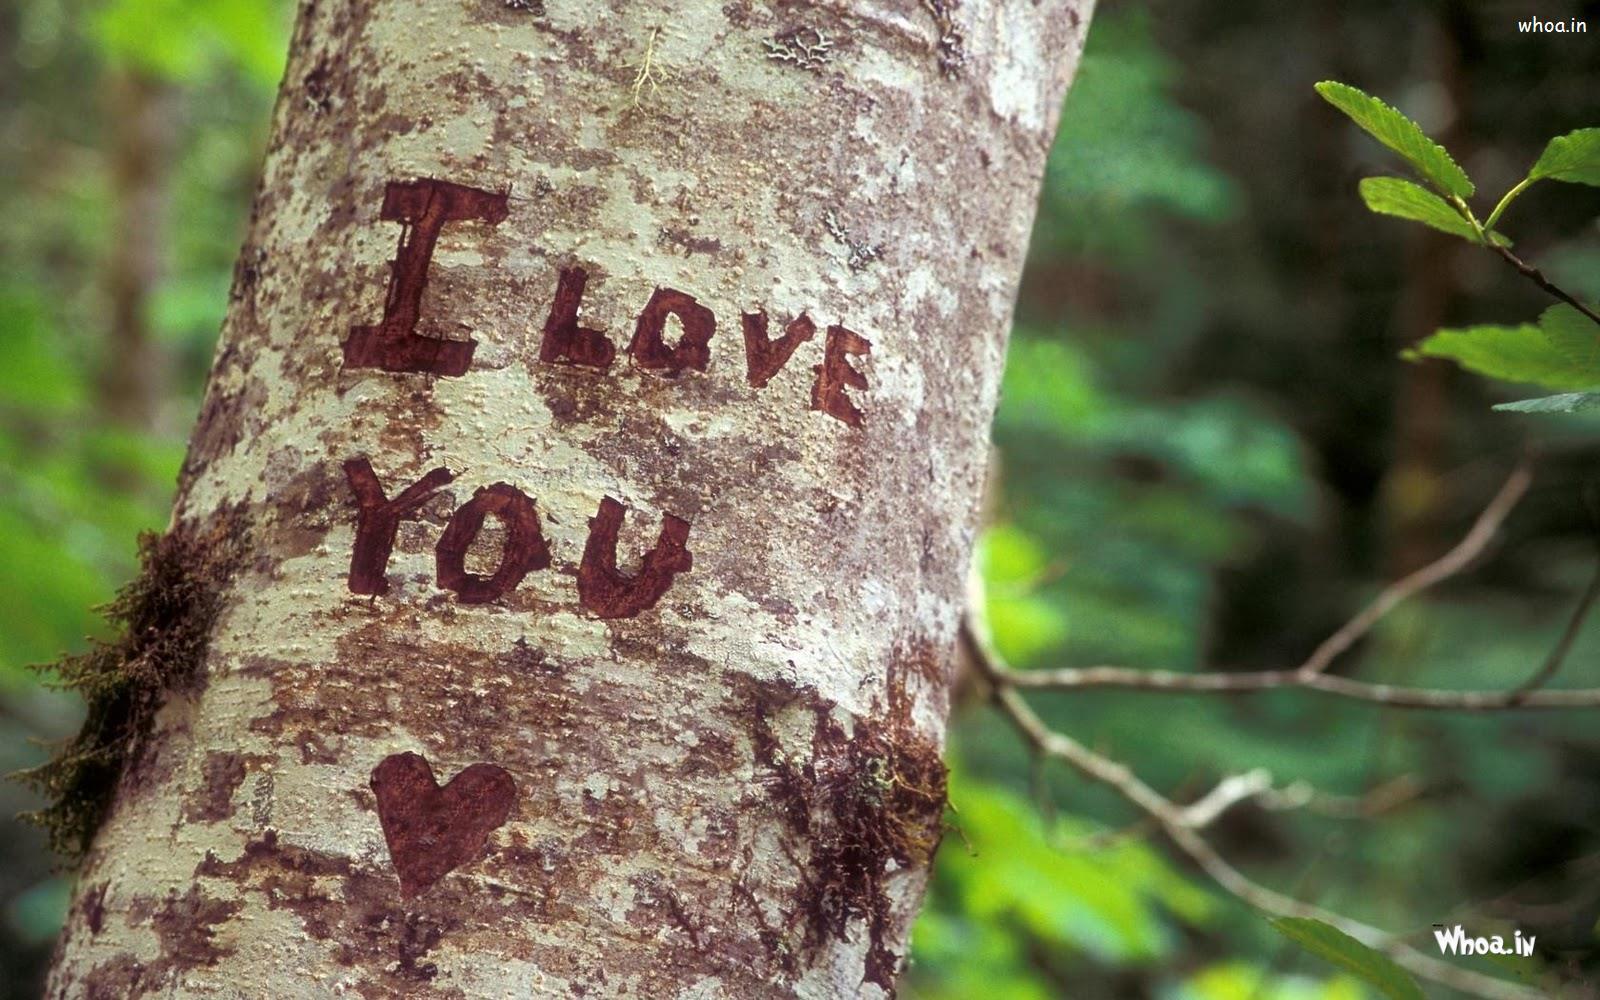 I Love You Heart Tree Nature Hd Wallpaper